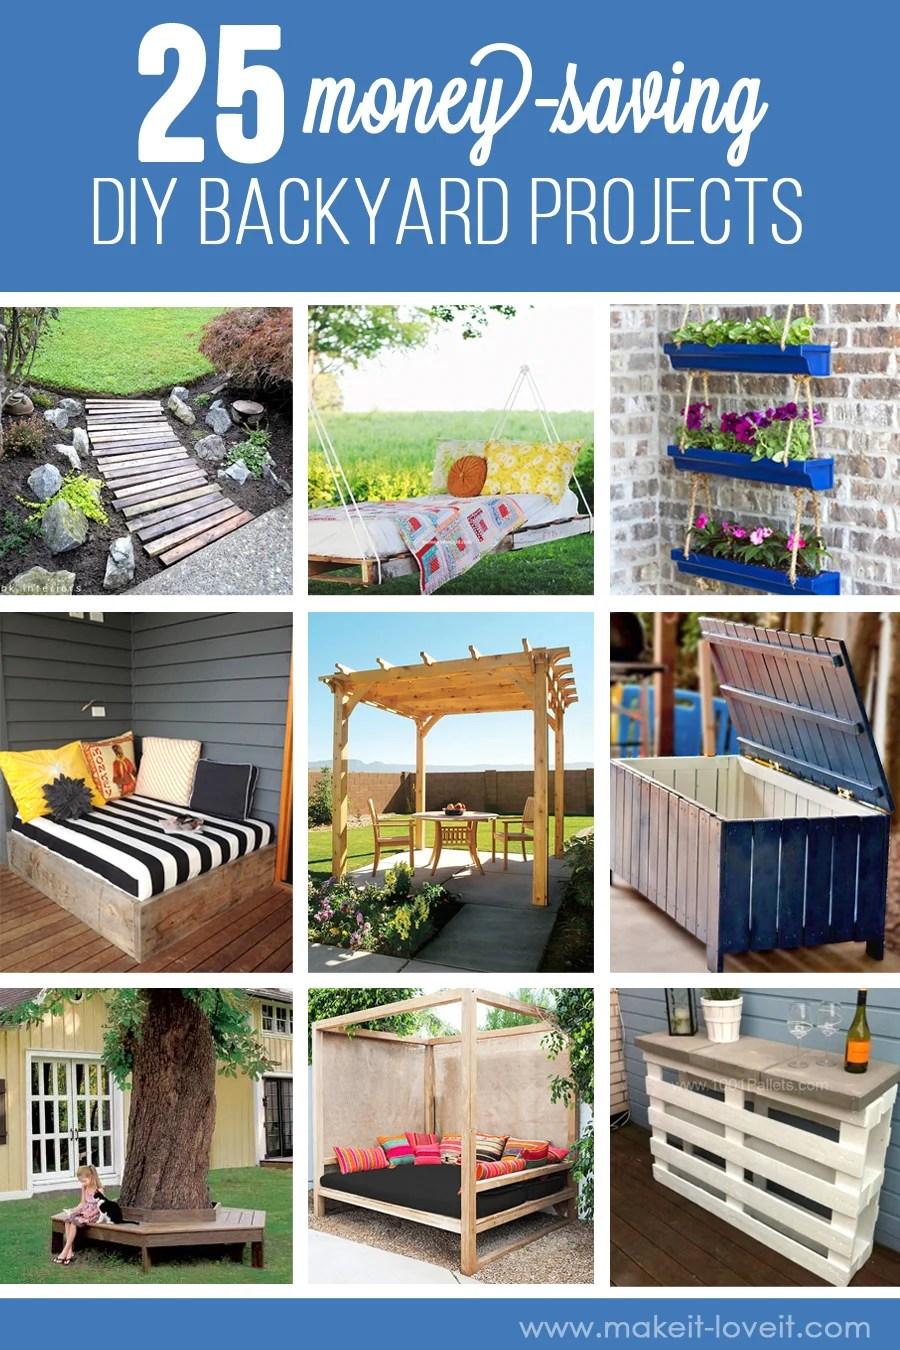 25 Money-Saving DIY Backyard Projects...to transform your space!! | www.makeit-loveit.com